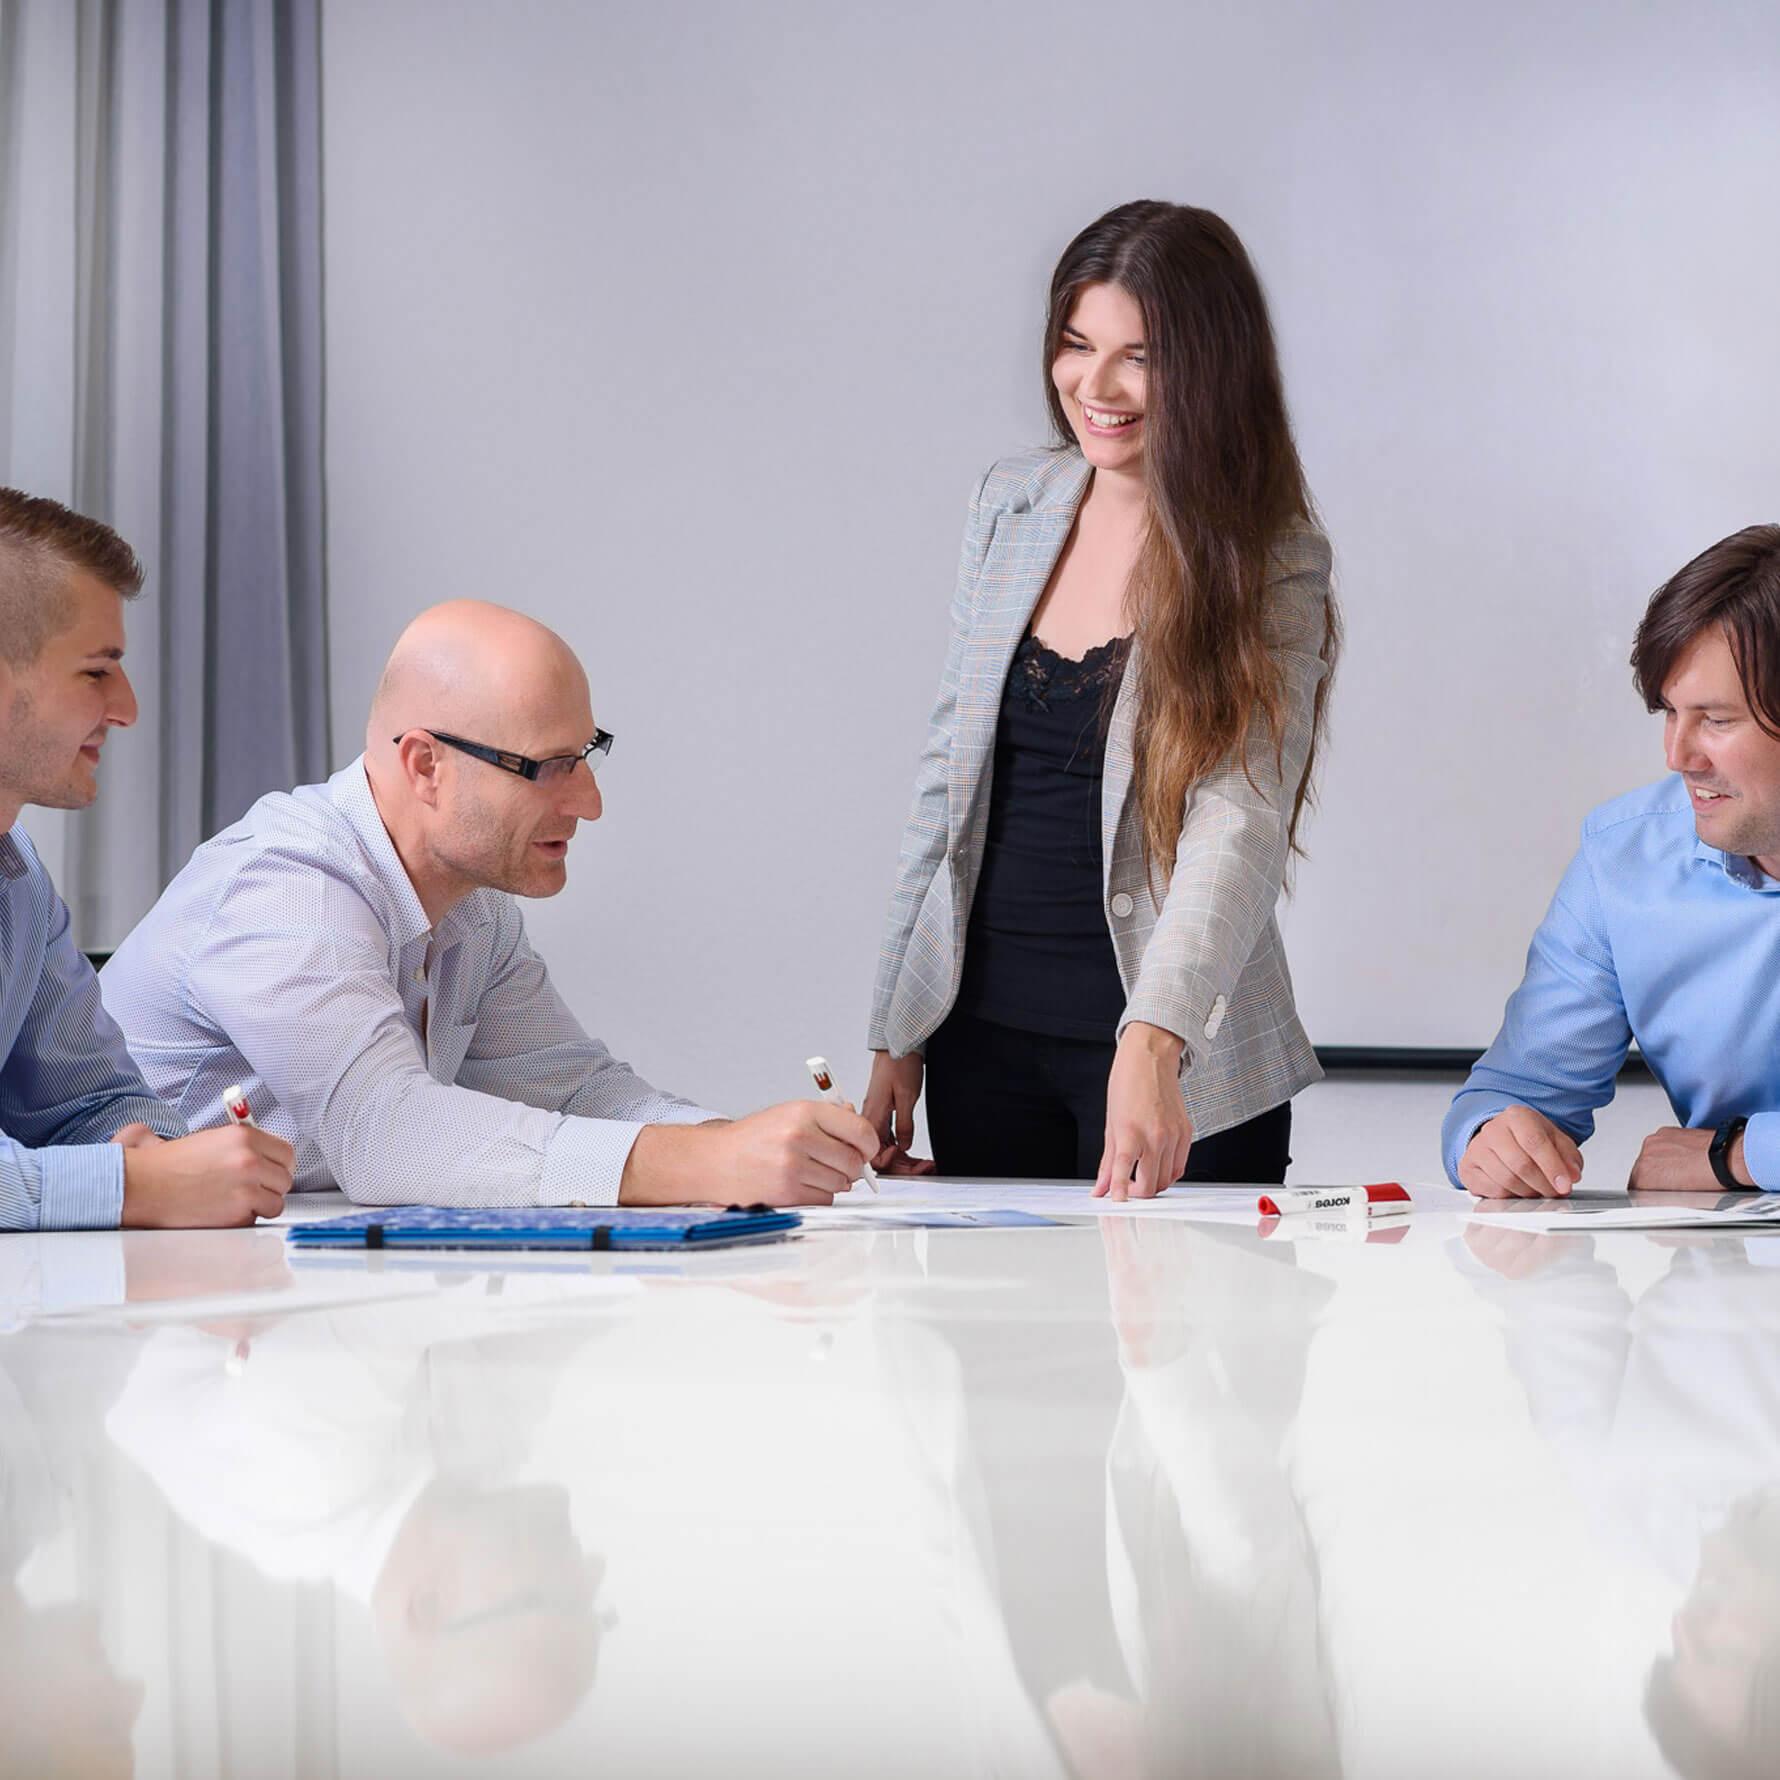 Porada zaměřena na klienty